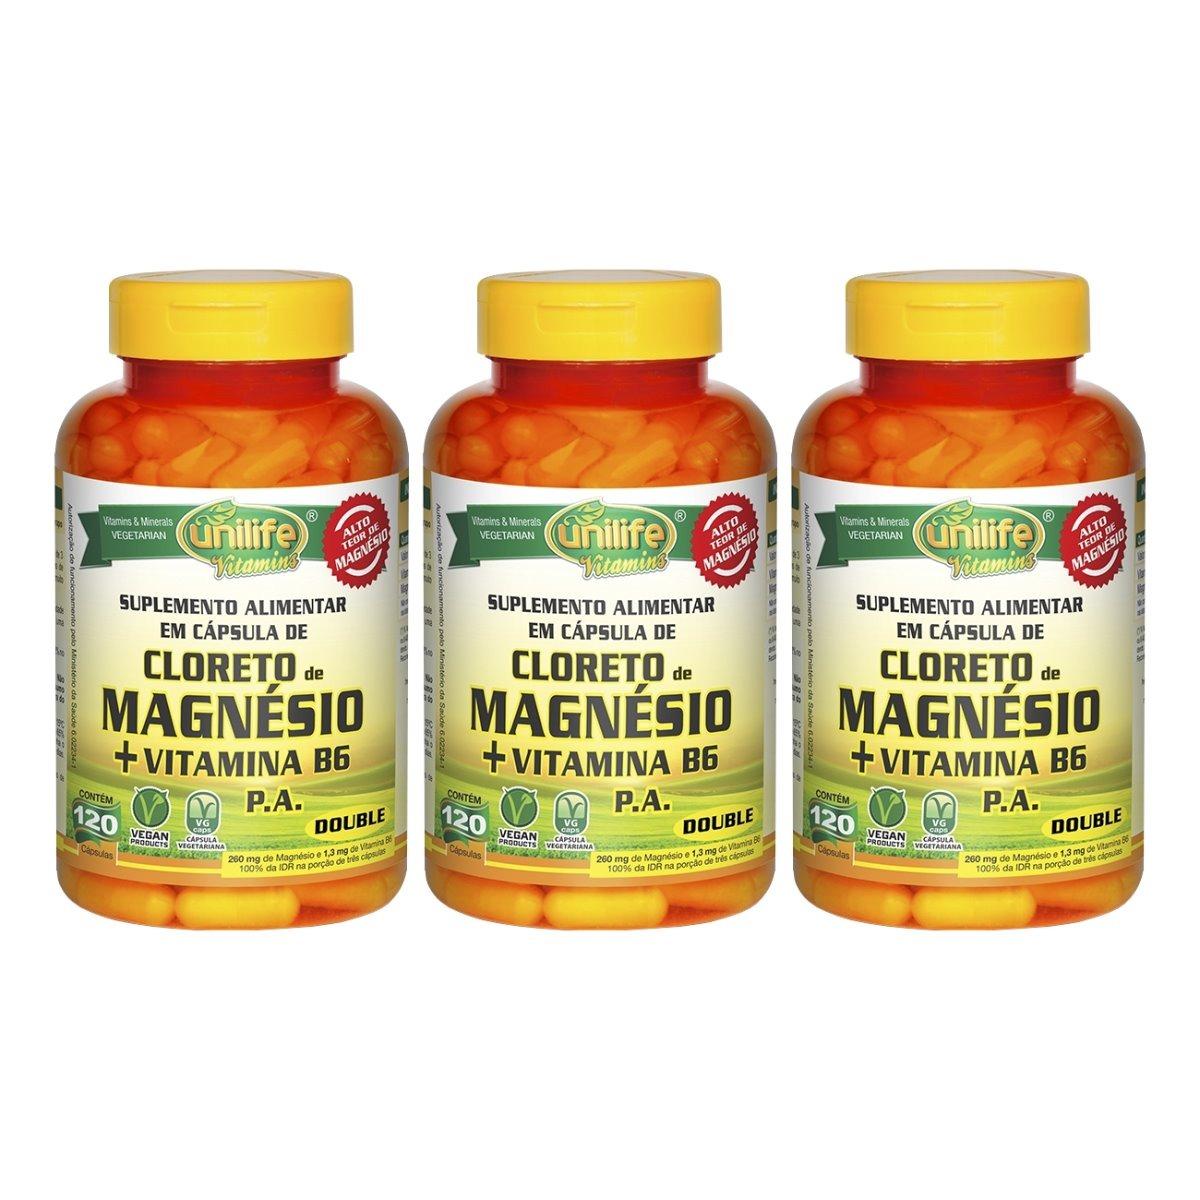 Cloreto De Magnésio P.A. + Vitamina B6 - 120 Cápsulas 800mg Unilife Kit 3 Unidades